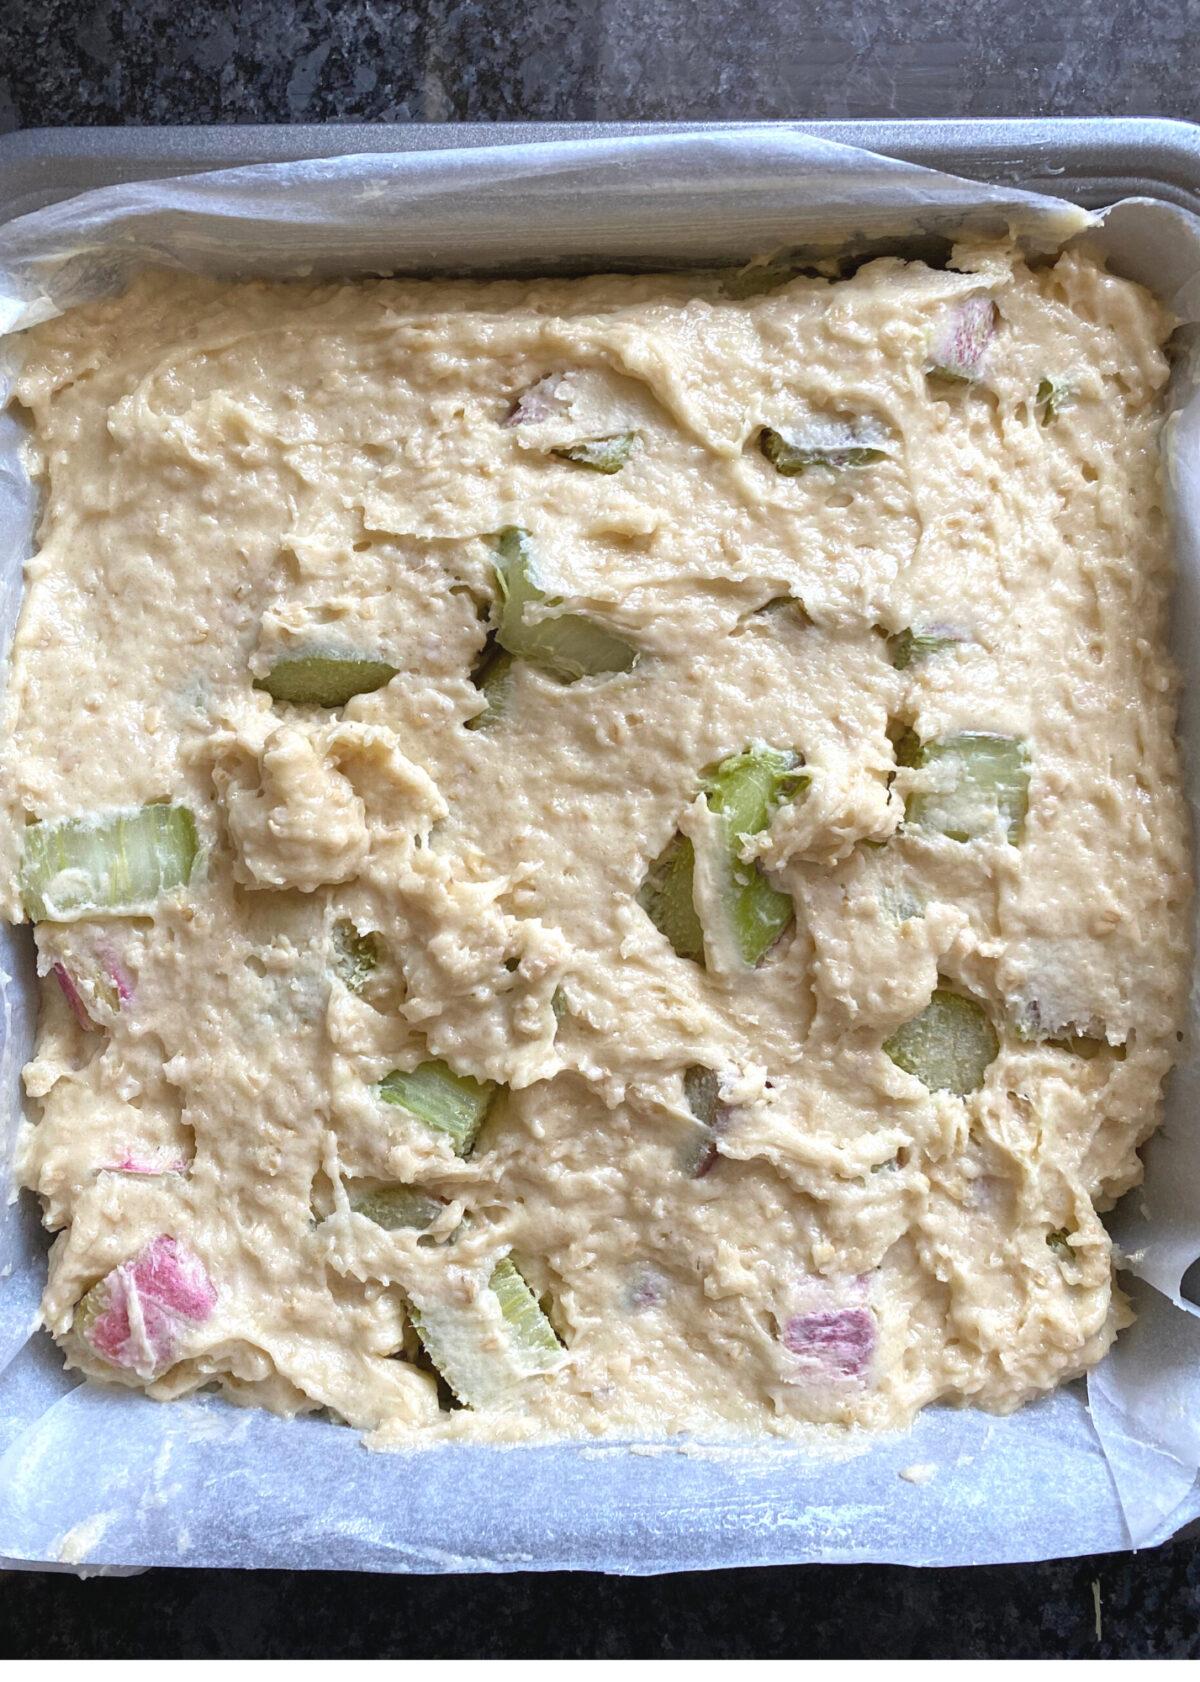 Lazy Daisy Rhubarb Oatmeal Cake, transfer cake batter to pan